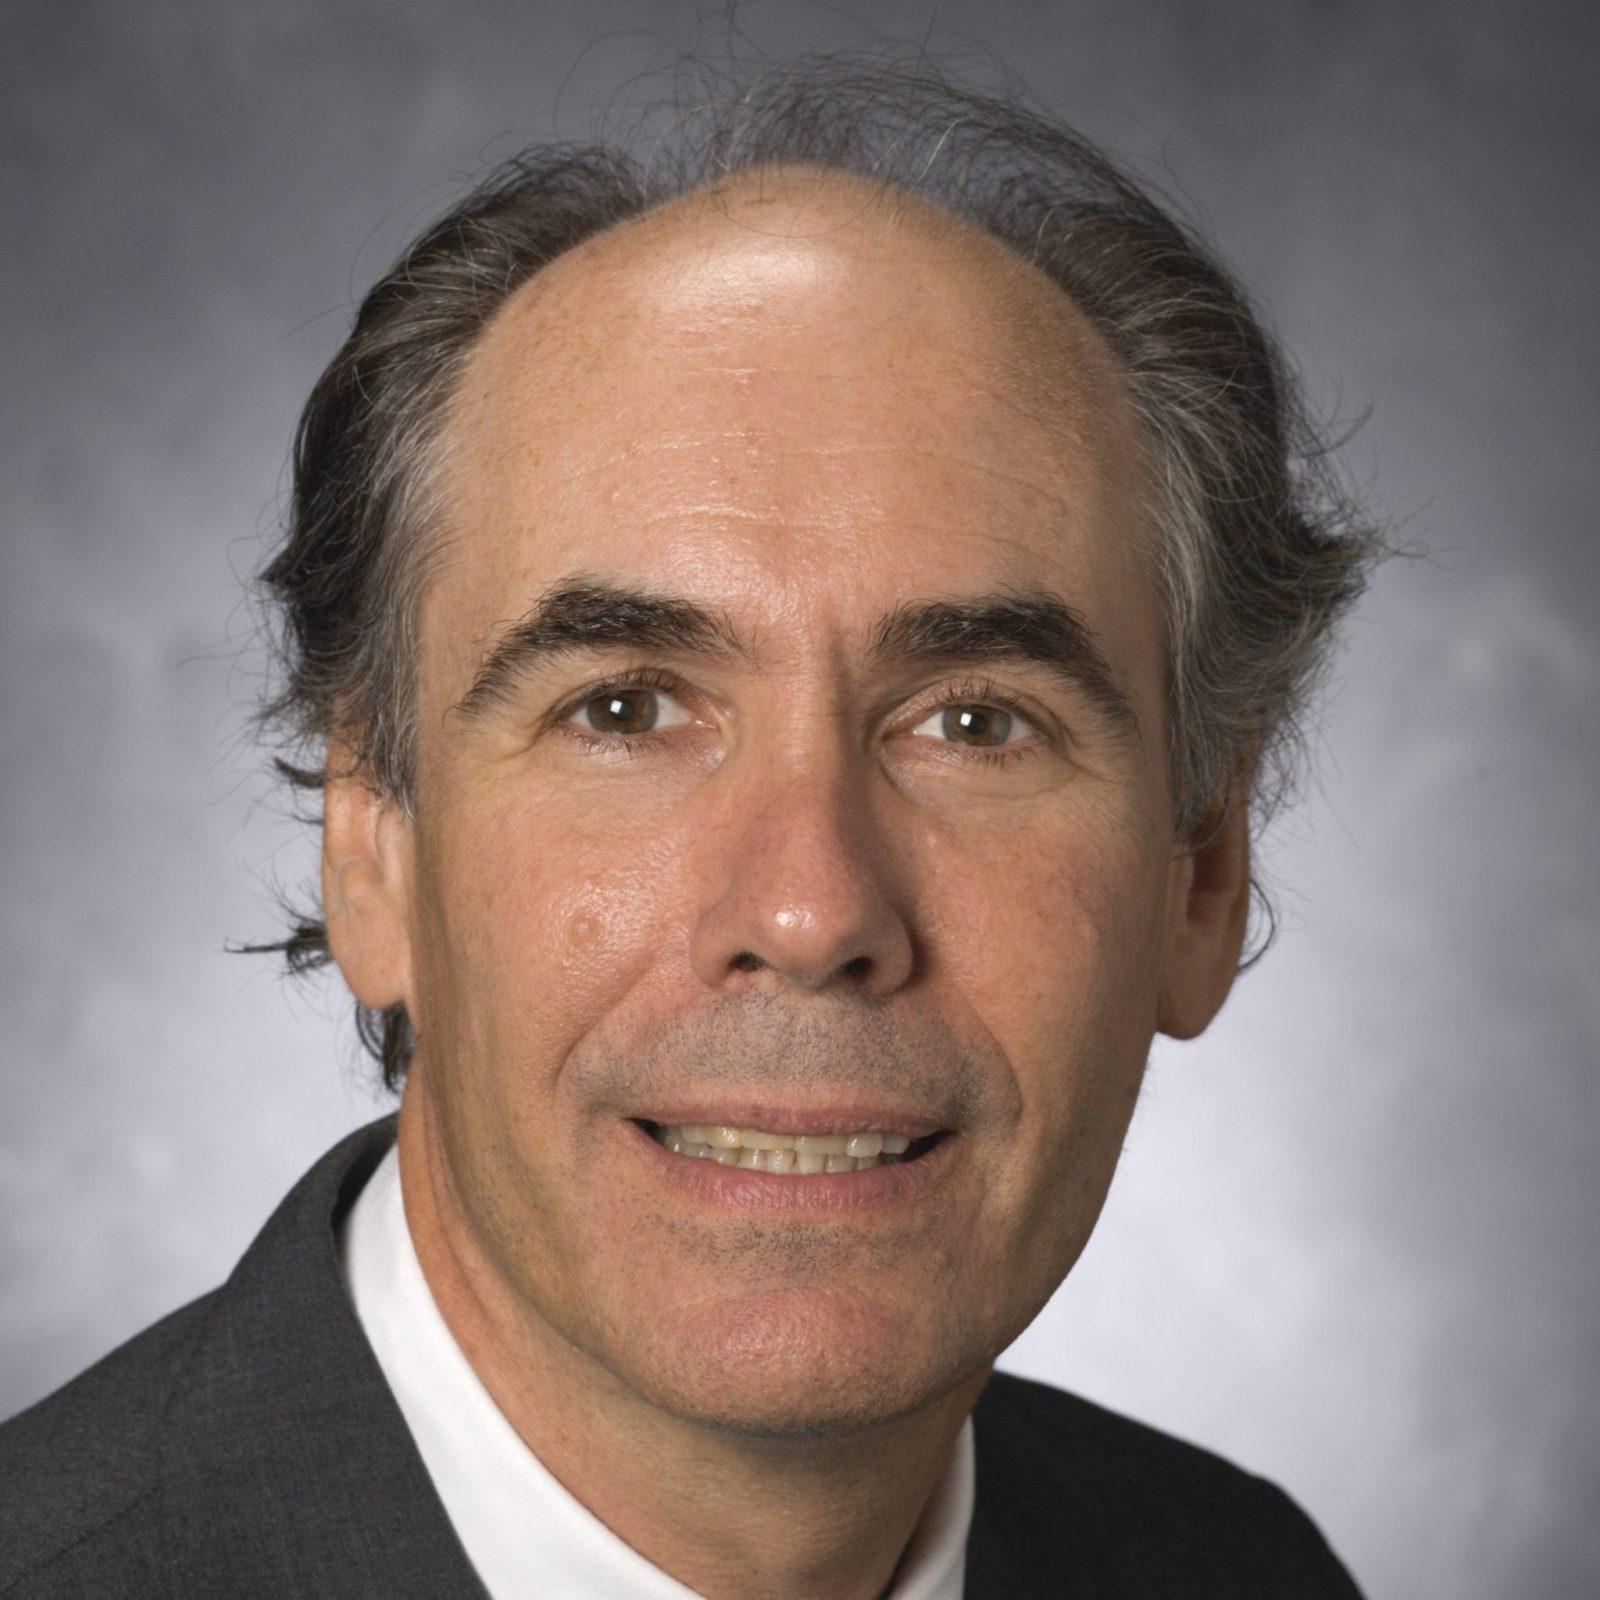 John Gittleman